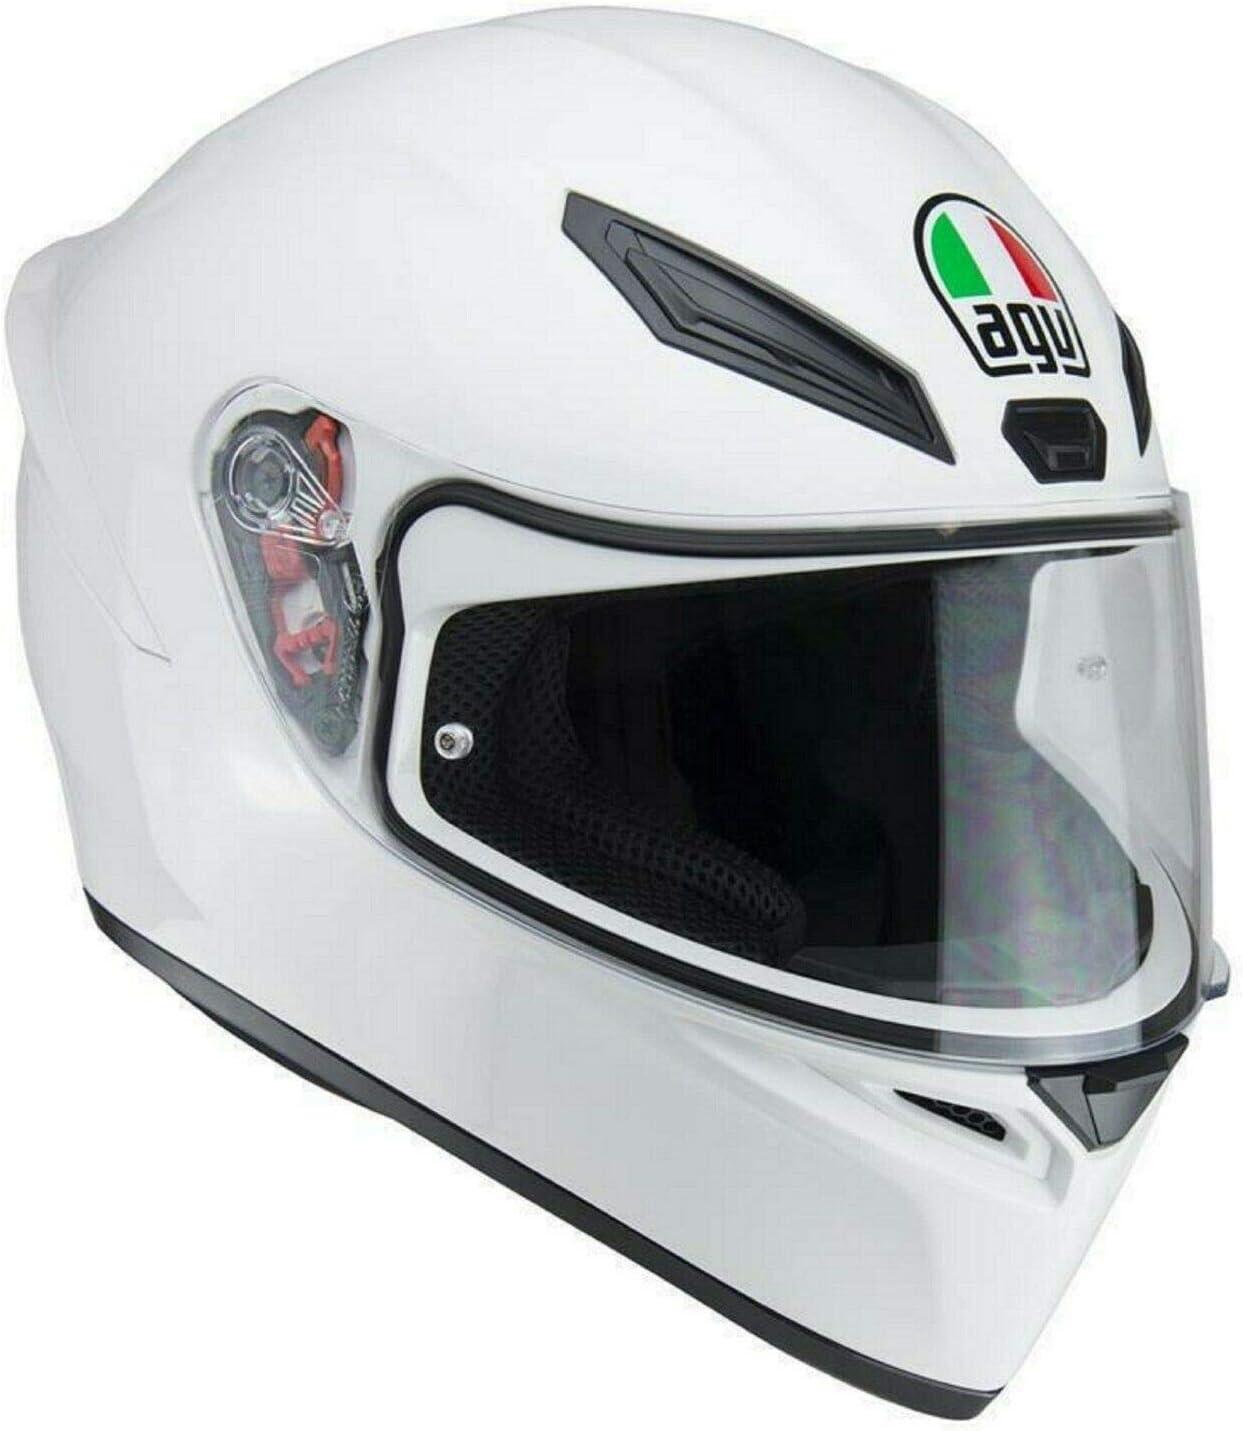 MOTORBIKE AGV K1 PLAIN SOLID FULL FACE MOTORCYCLE HELMET Adult Crash Biker Rider Scooter Sports Racing Touring Pinlock Ready Helmet